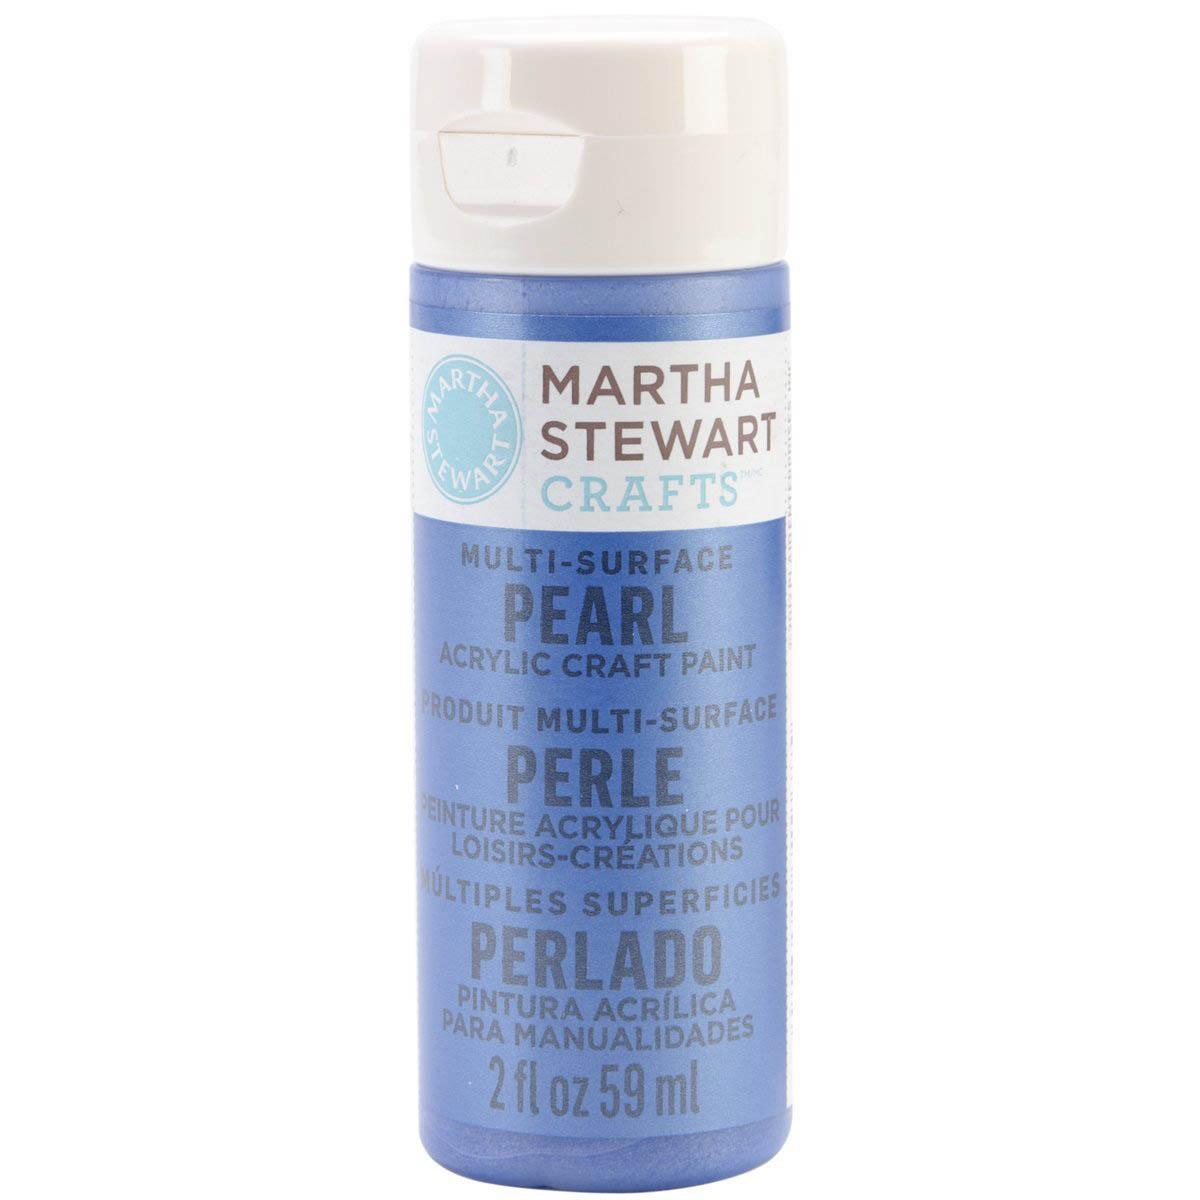 Martha Stewart® 2oz Multi-Surface Pearl Acrylic Craft Paint - Cornflower